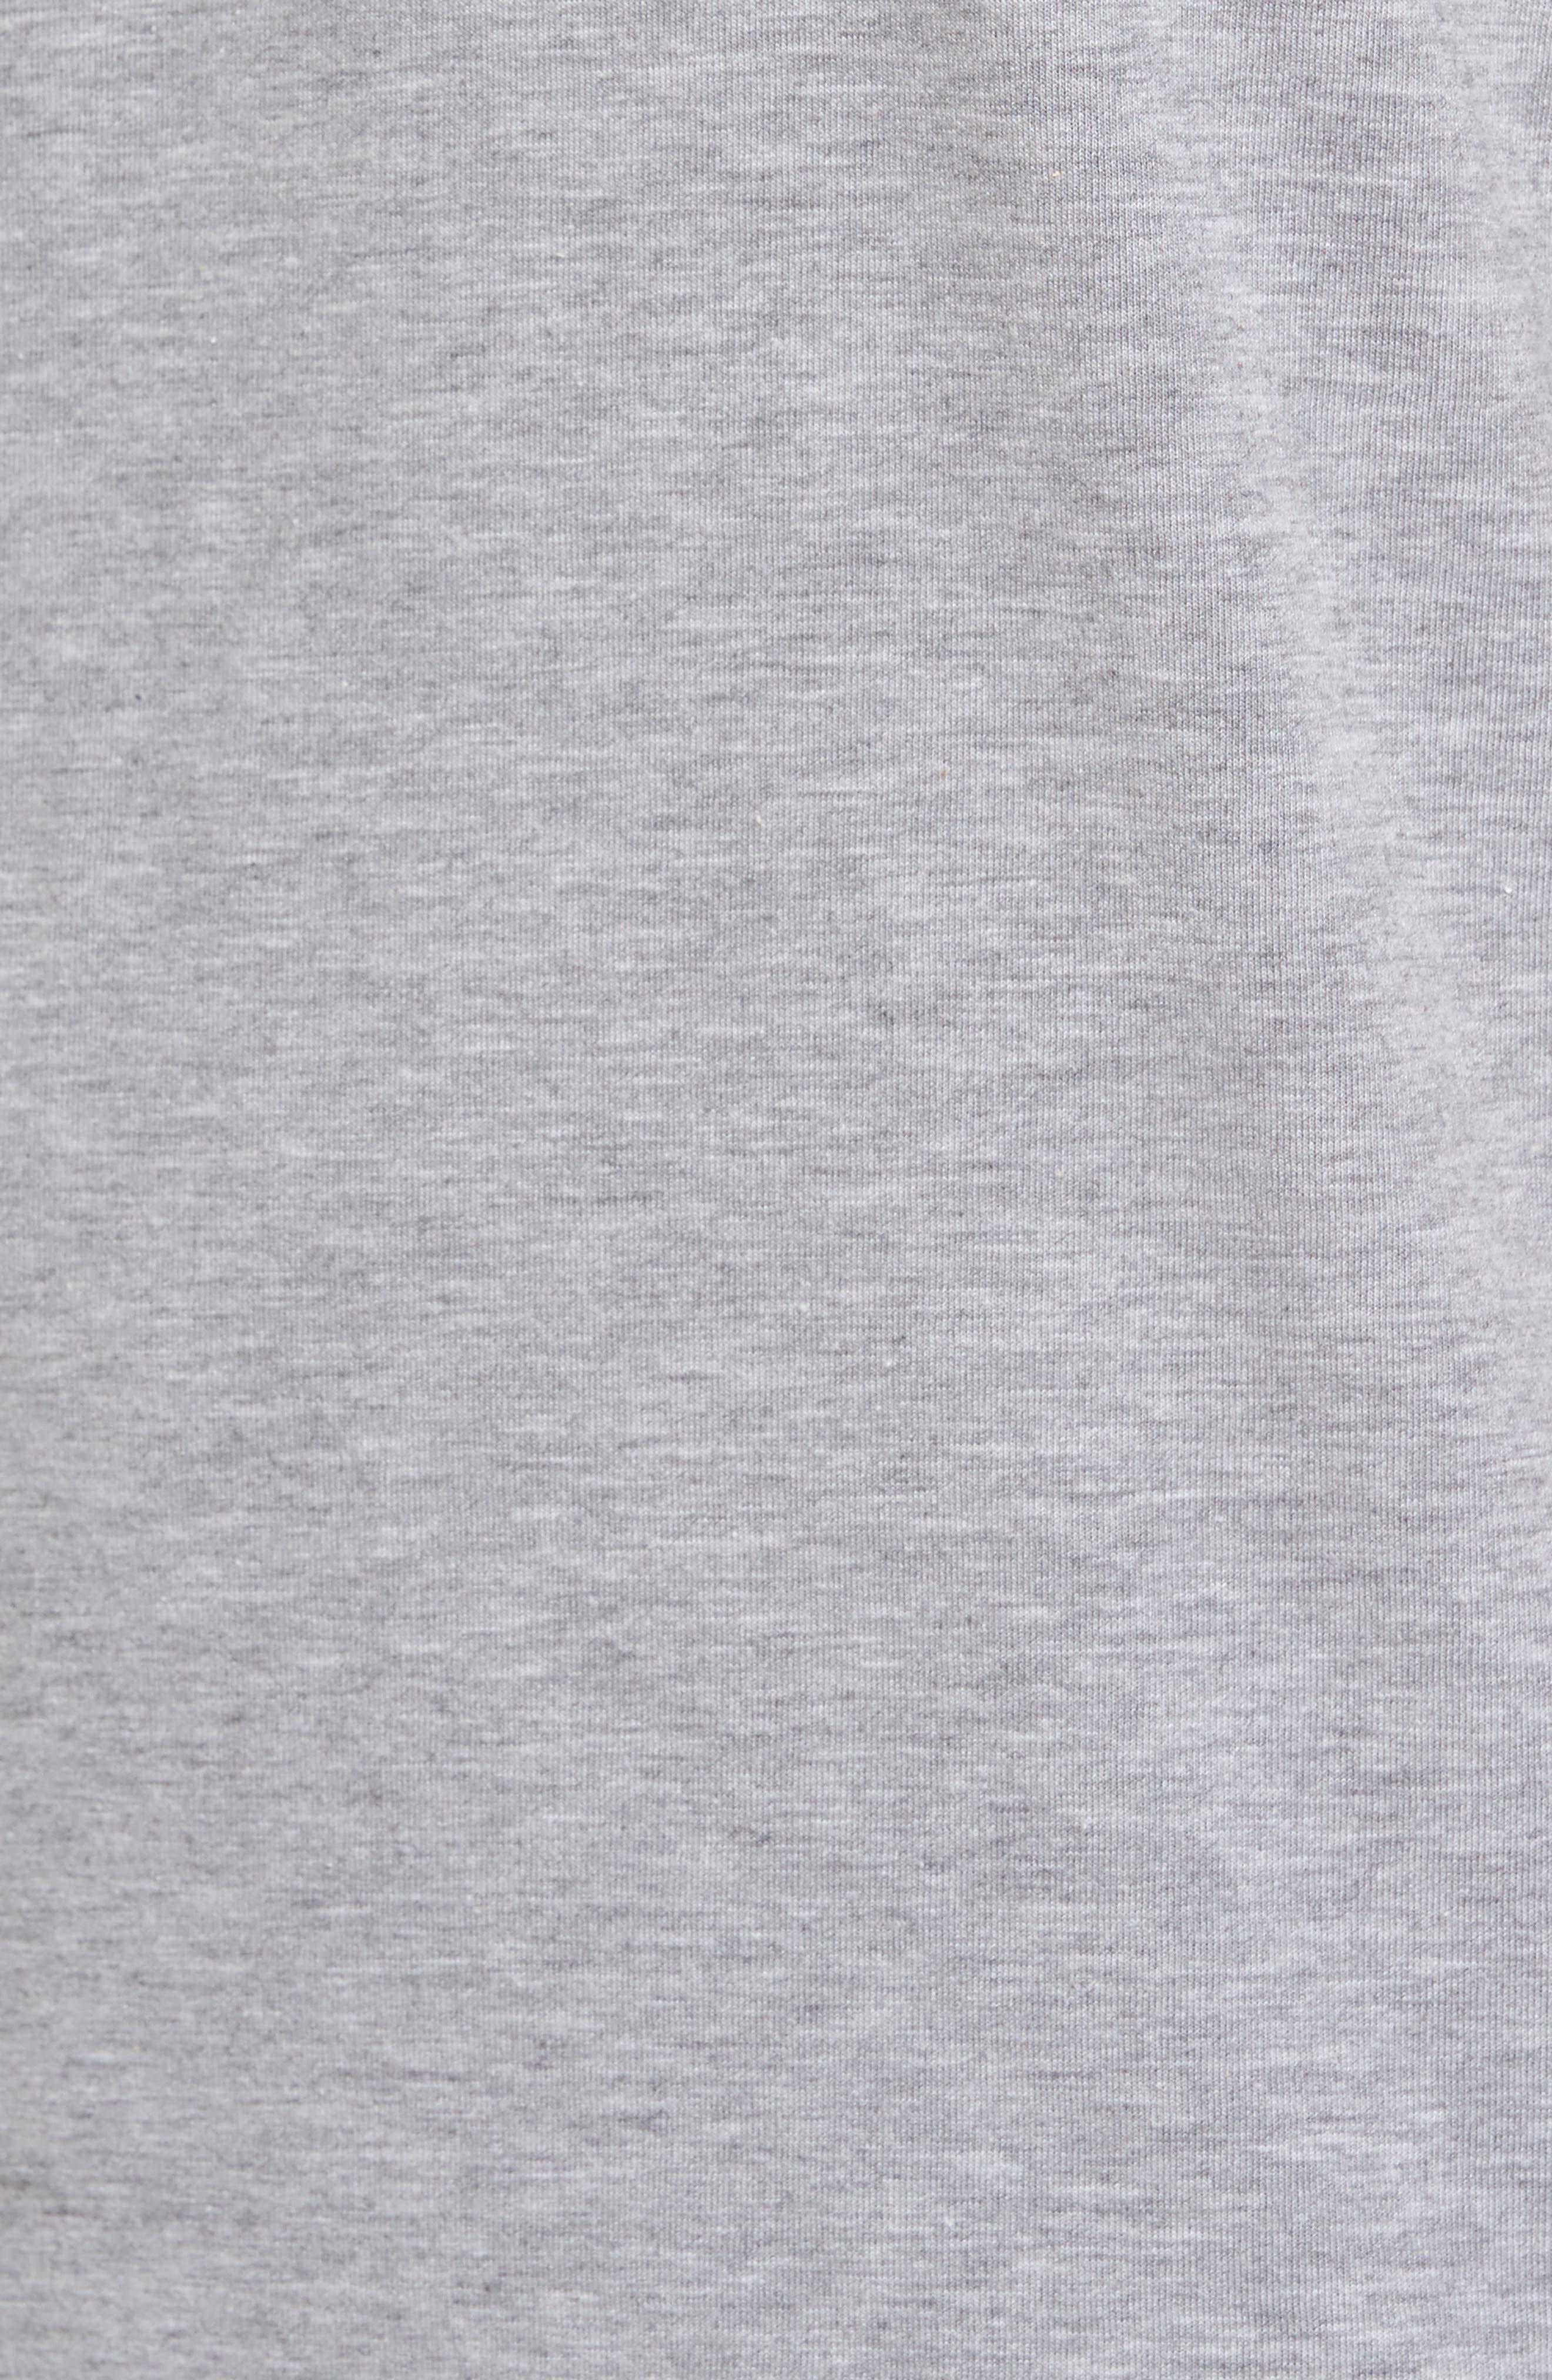 Los Angeles Rams Ringer T-Shirt,                             Alternate thumbnail 5, color,                             020